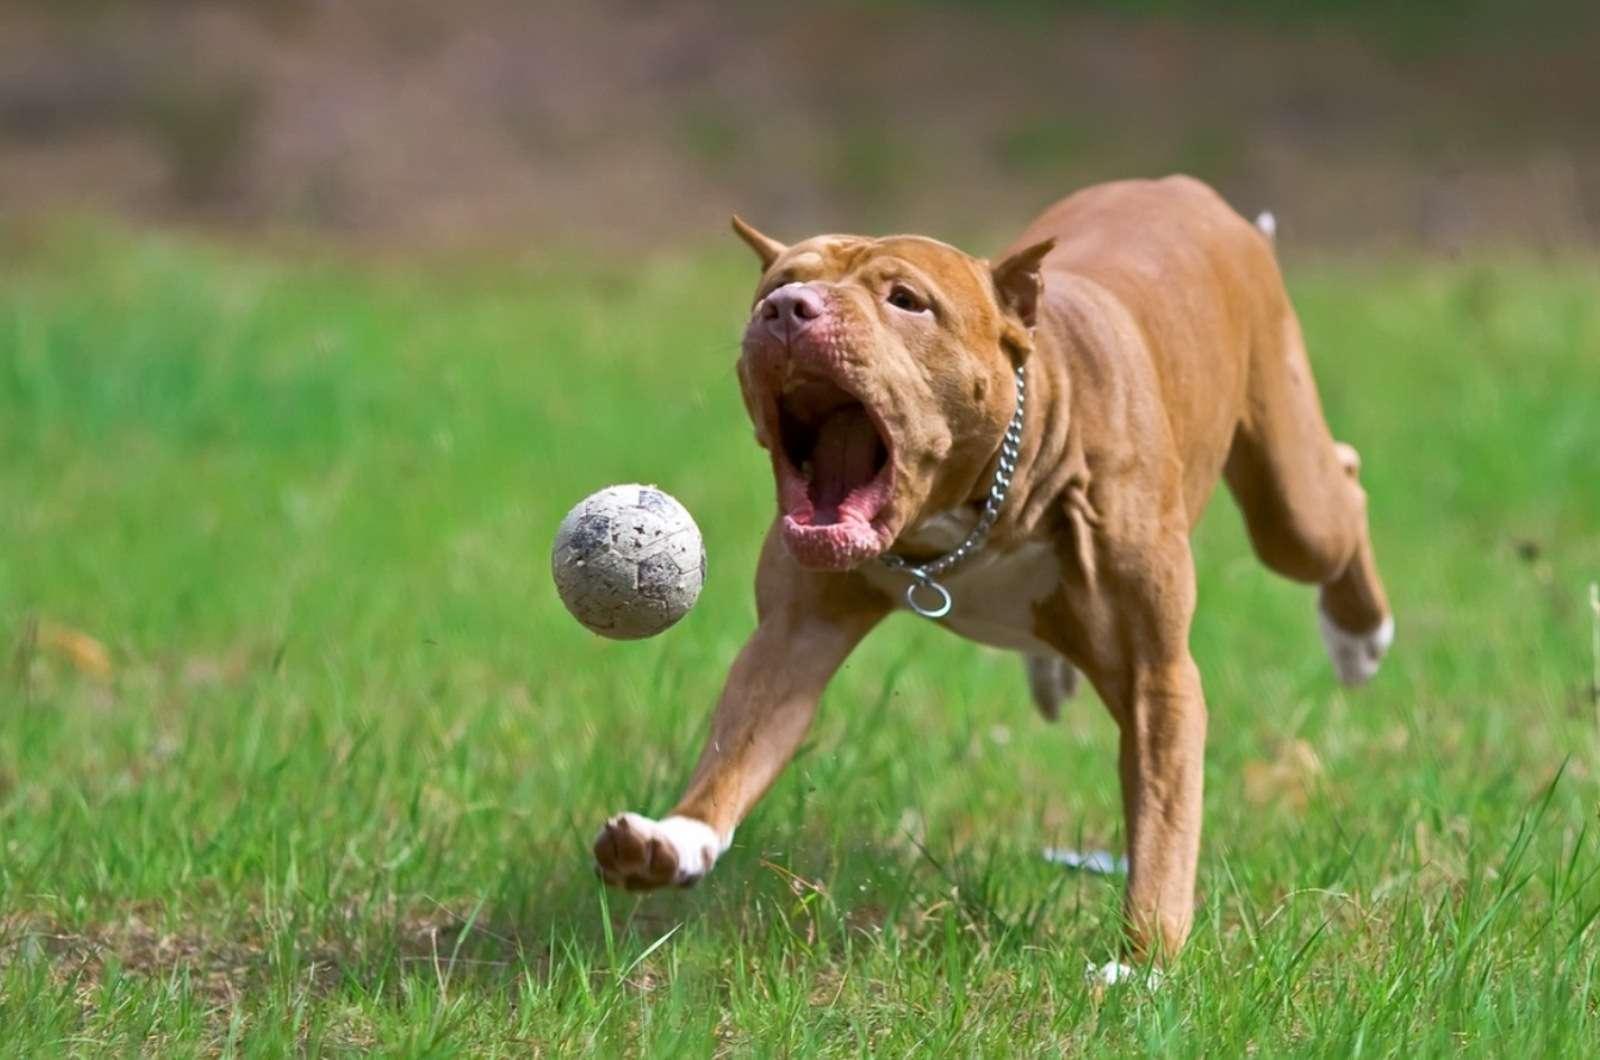 Молодой питбуль фото собаки, Молодой питбуль фото породы ...: http://www.zooclub.ru/wallpaper/21467